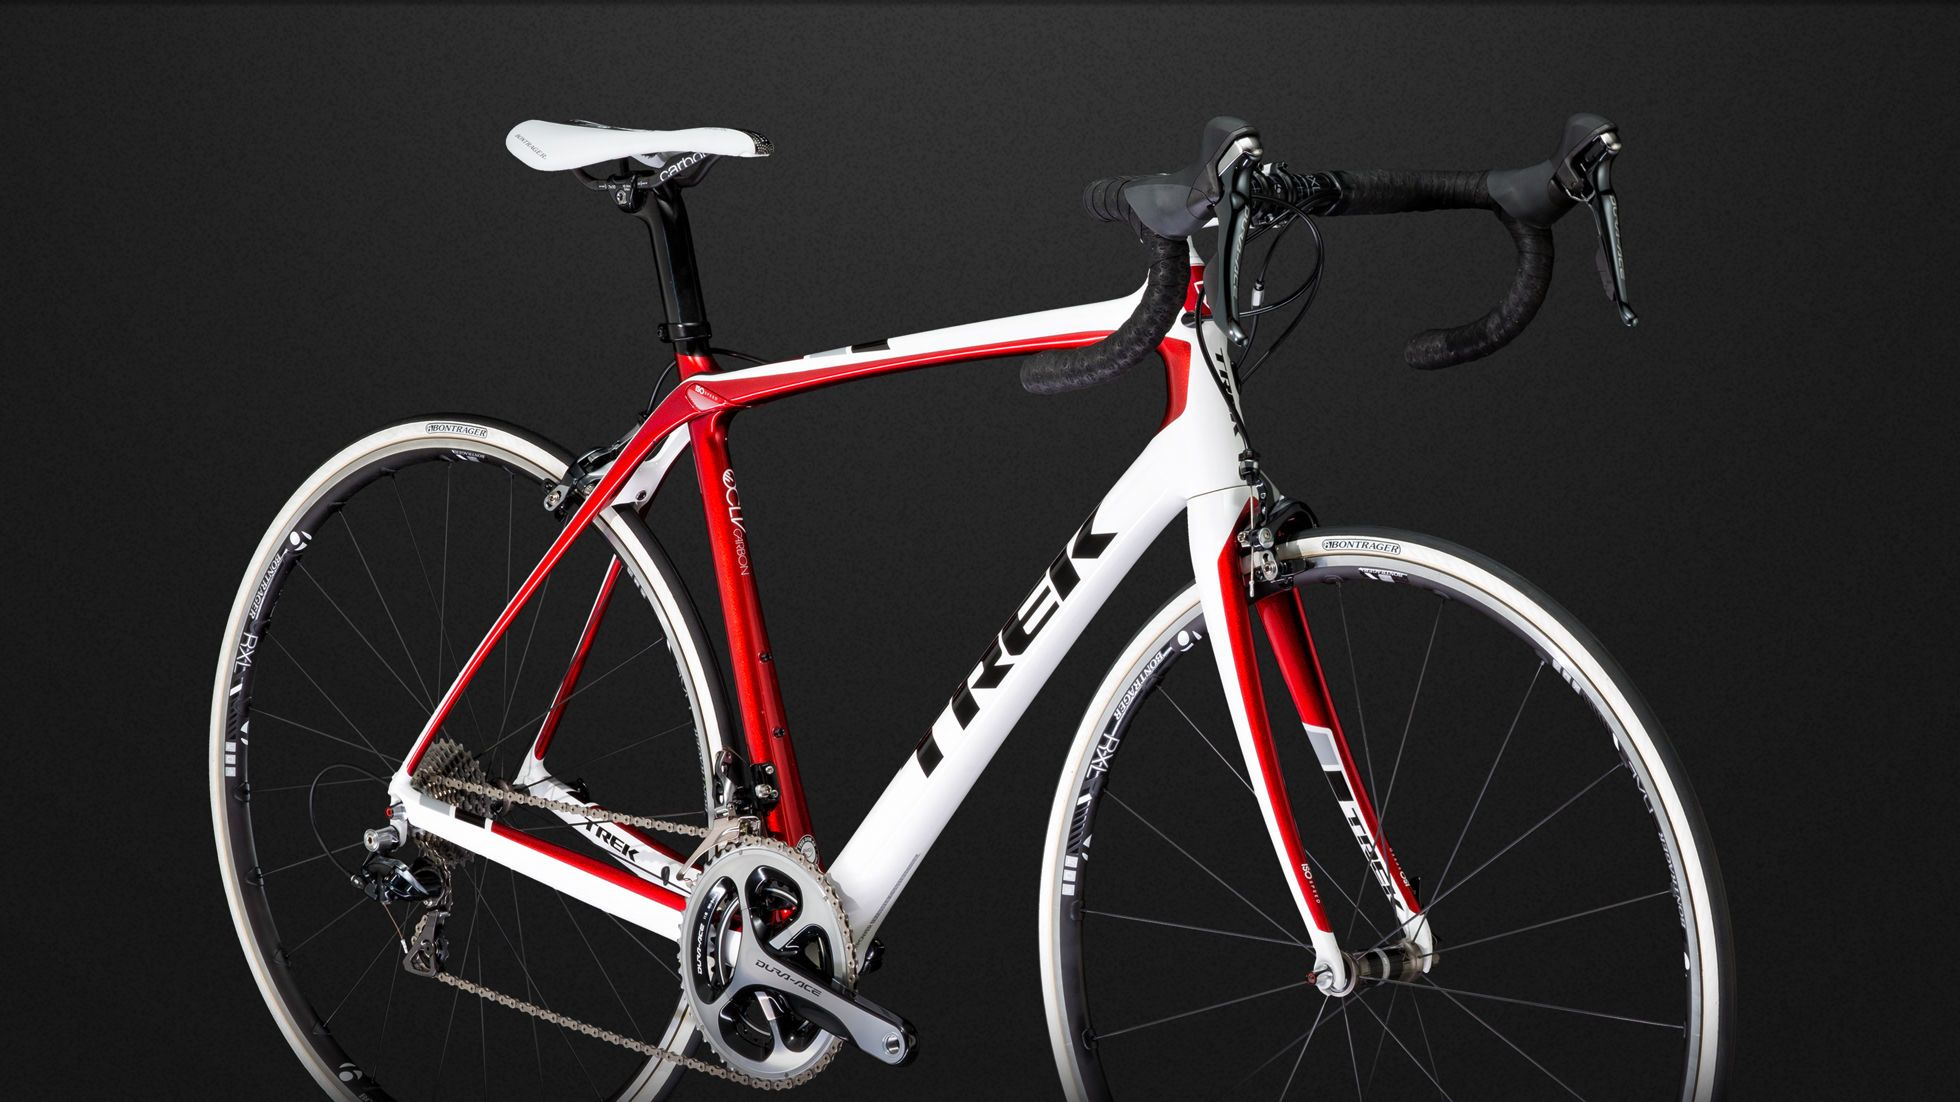 Silique C Cycling Trek Trekbicycles Road Endurance Womenscycling Carbon Bicycle Bike Trekbikesroad Road Bike Women Road Bike Bike